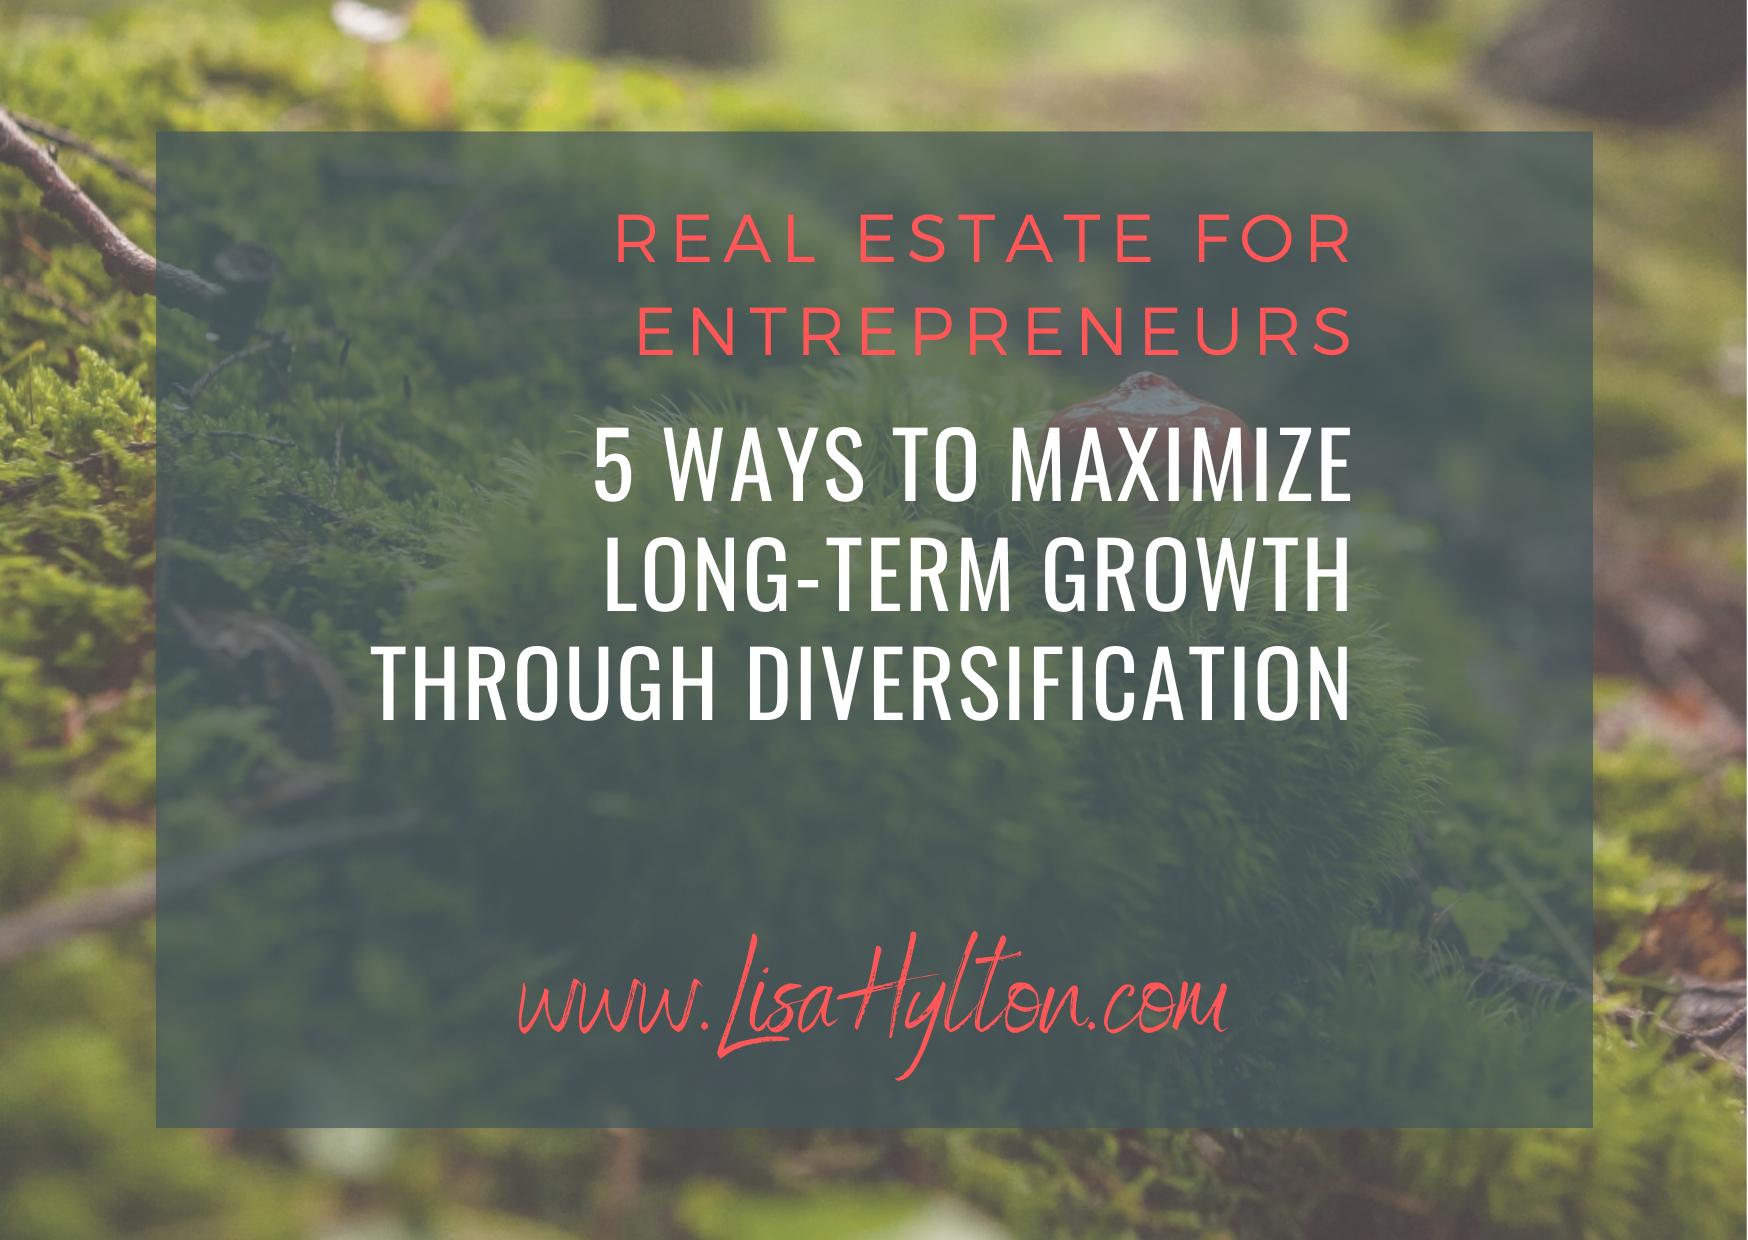 5 Ways To Maximize Long-Term Growth Through Diversification